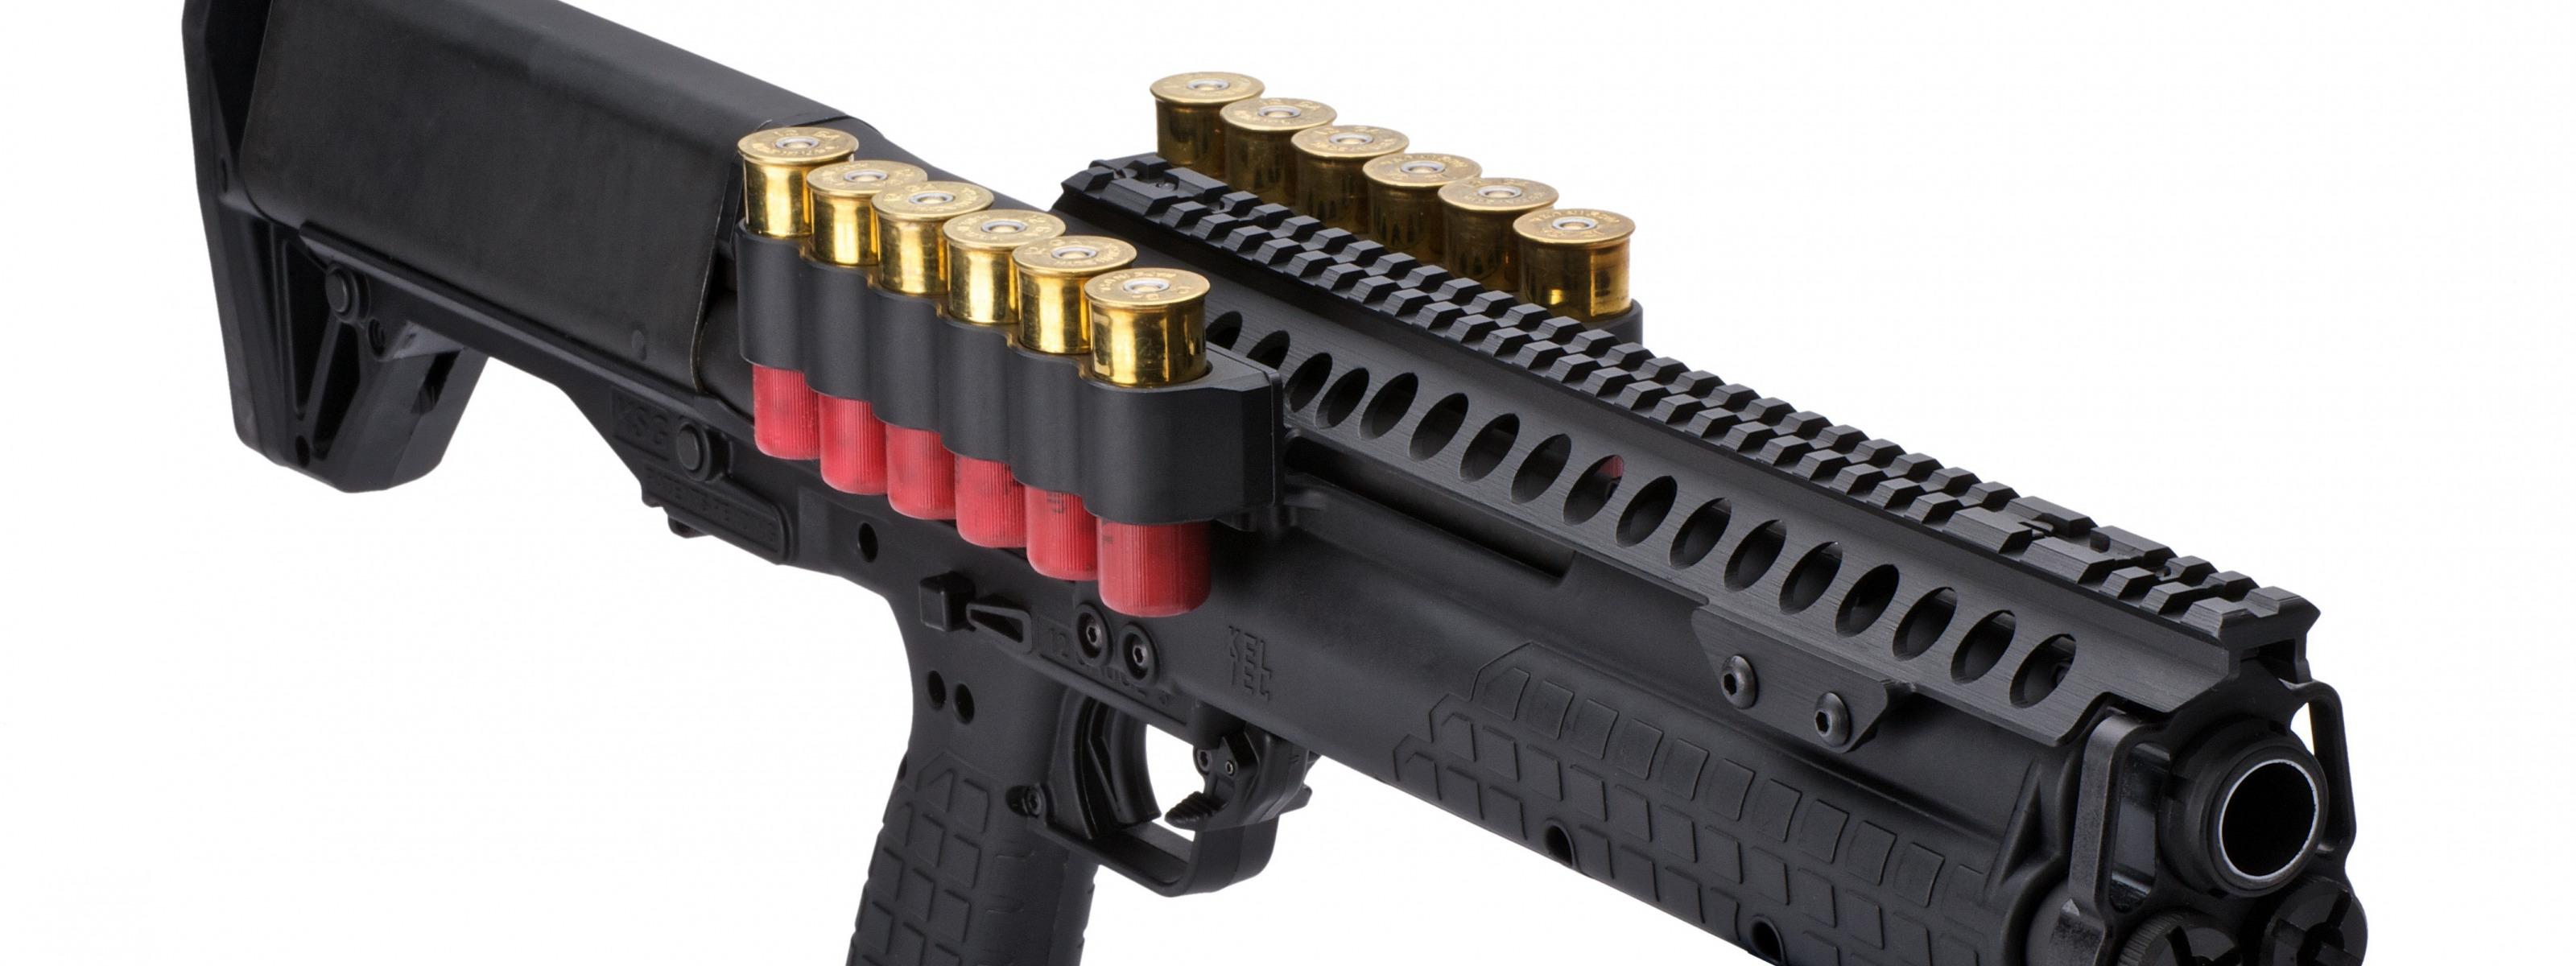 mesa tactical products - HD3200×1200